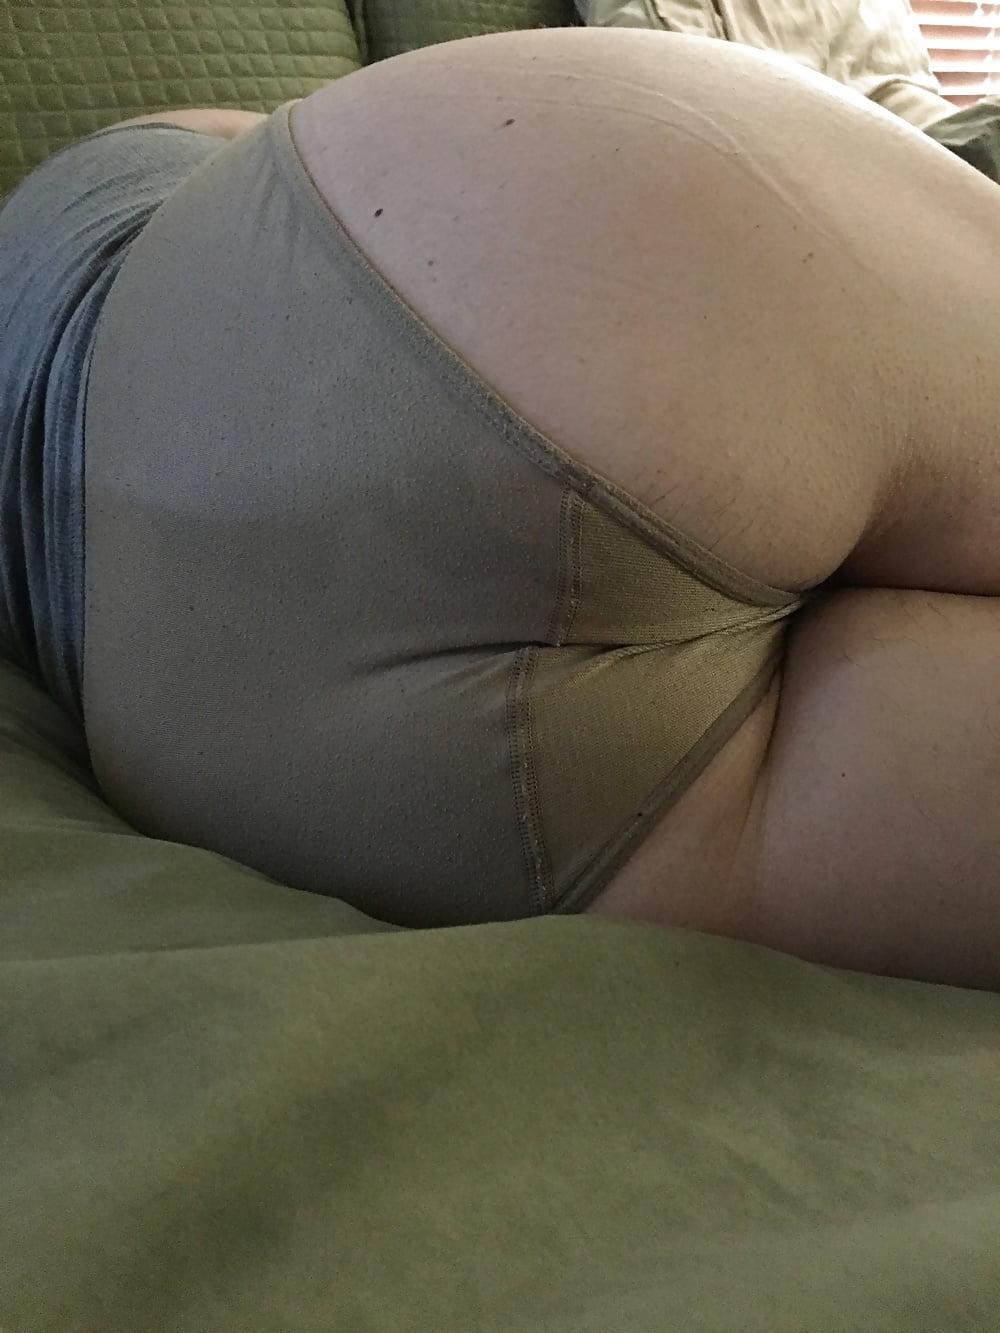 Porn movie Asian girl hand job